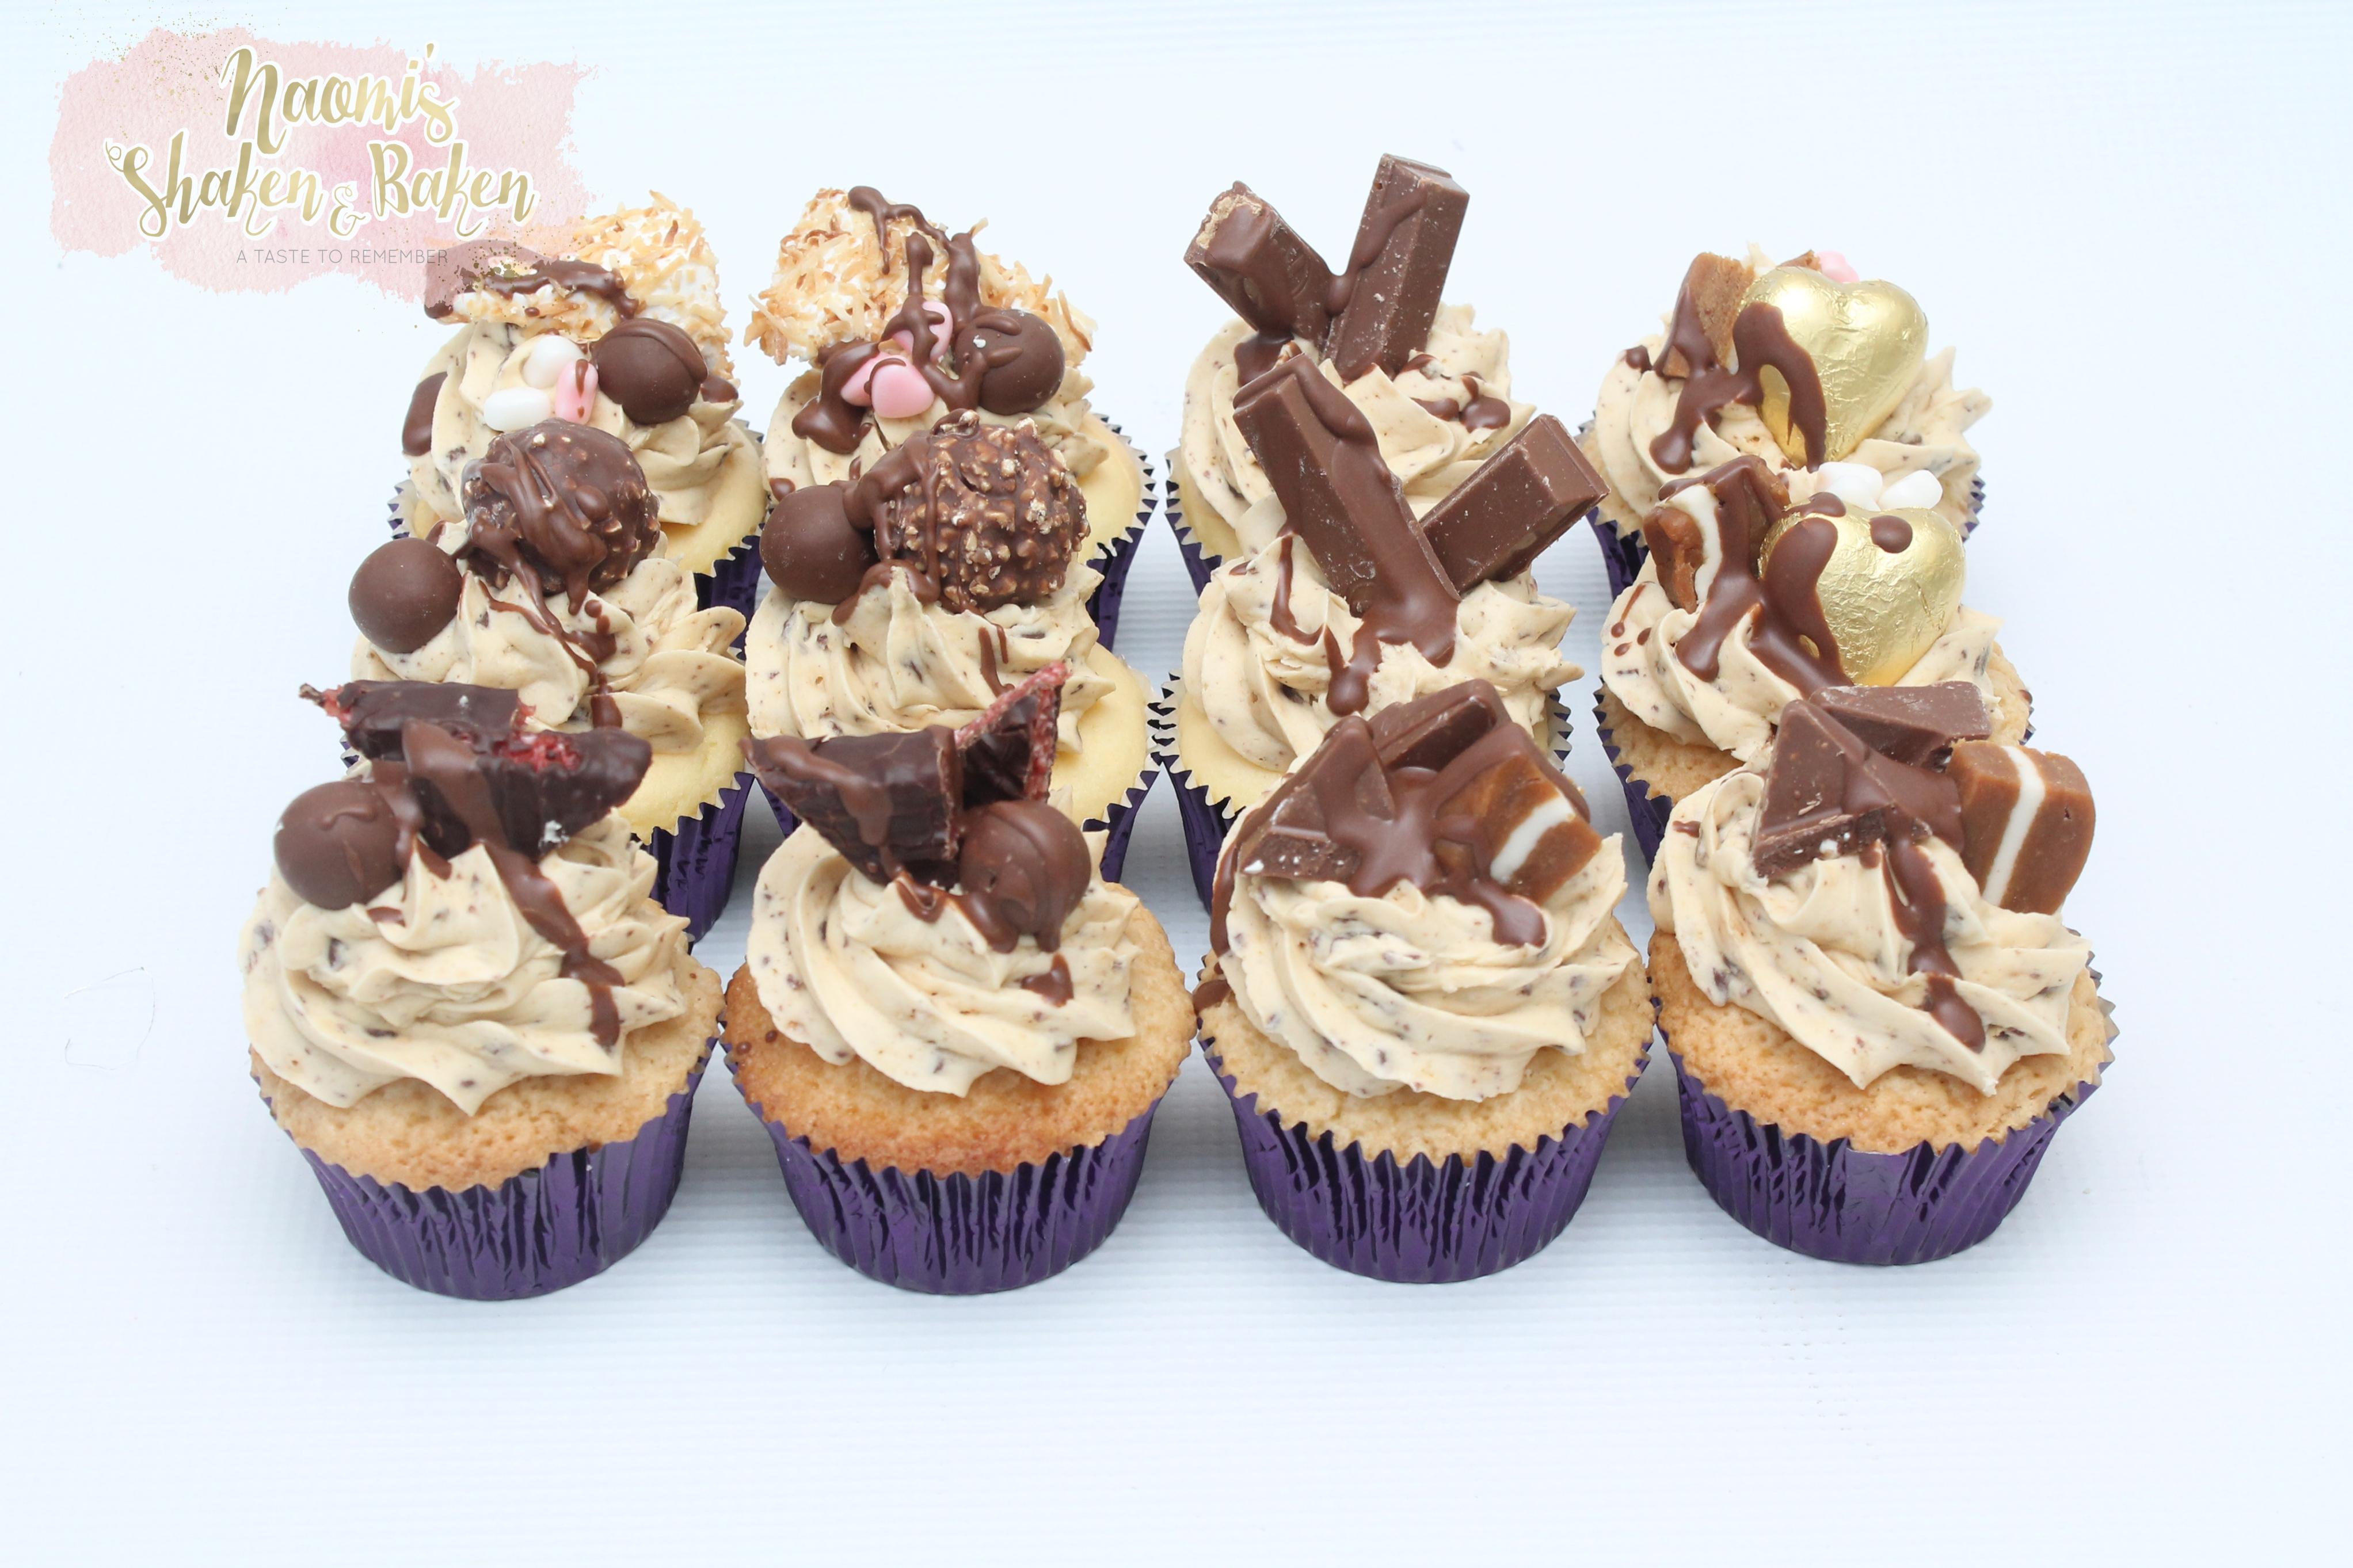 Mixed chocolate cupcakes